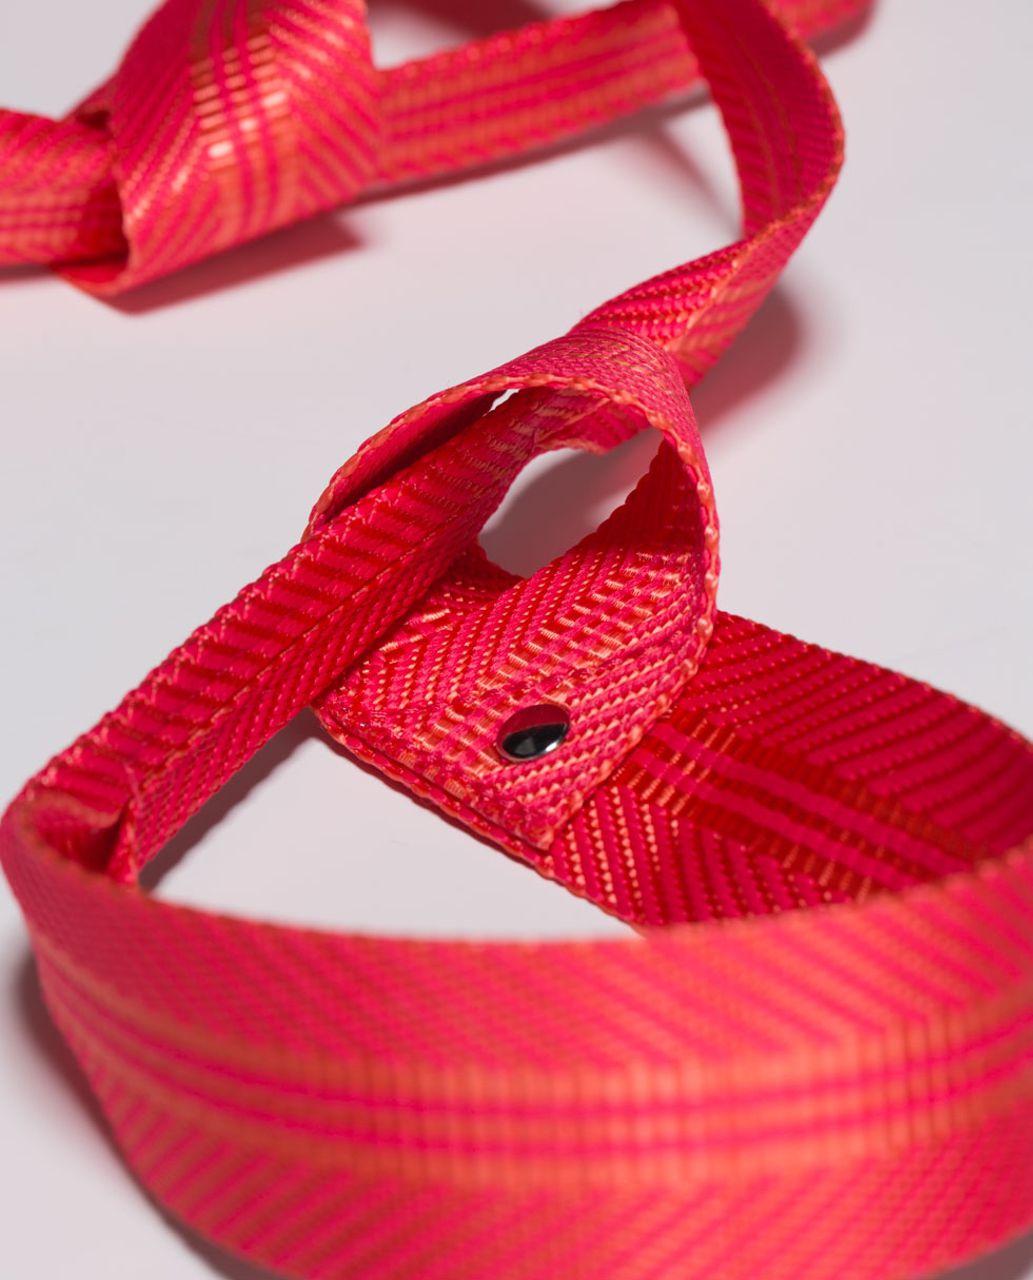 Lululemon Loop It Up Mat Strap - Plum Peach / Atomic Red